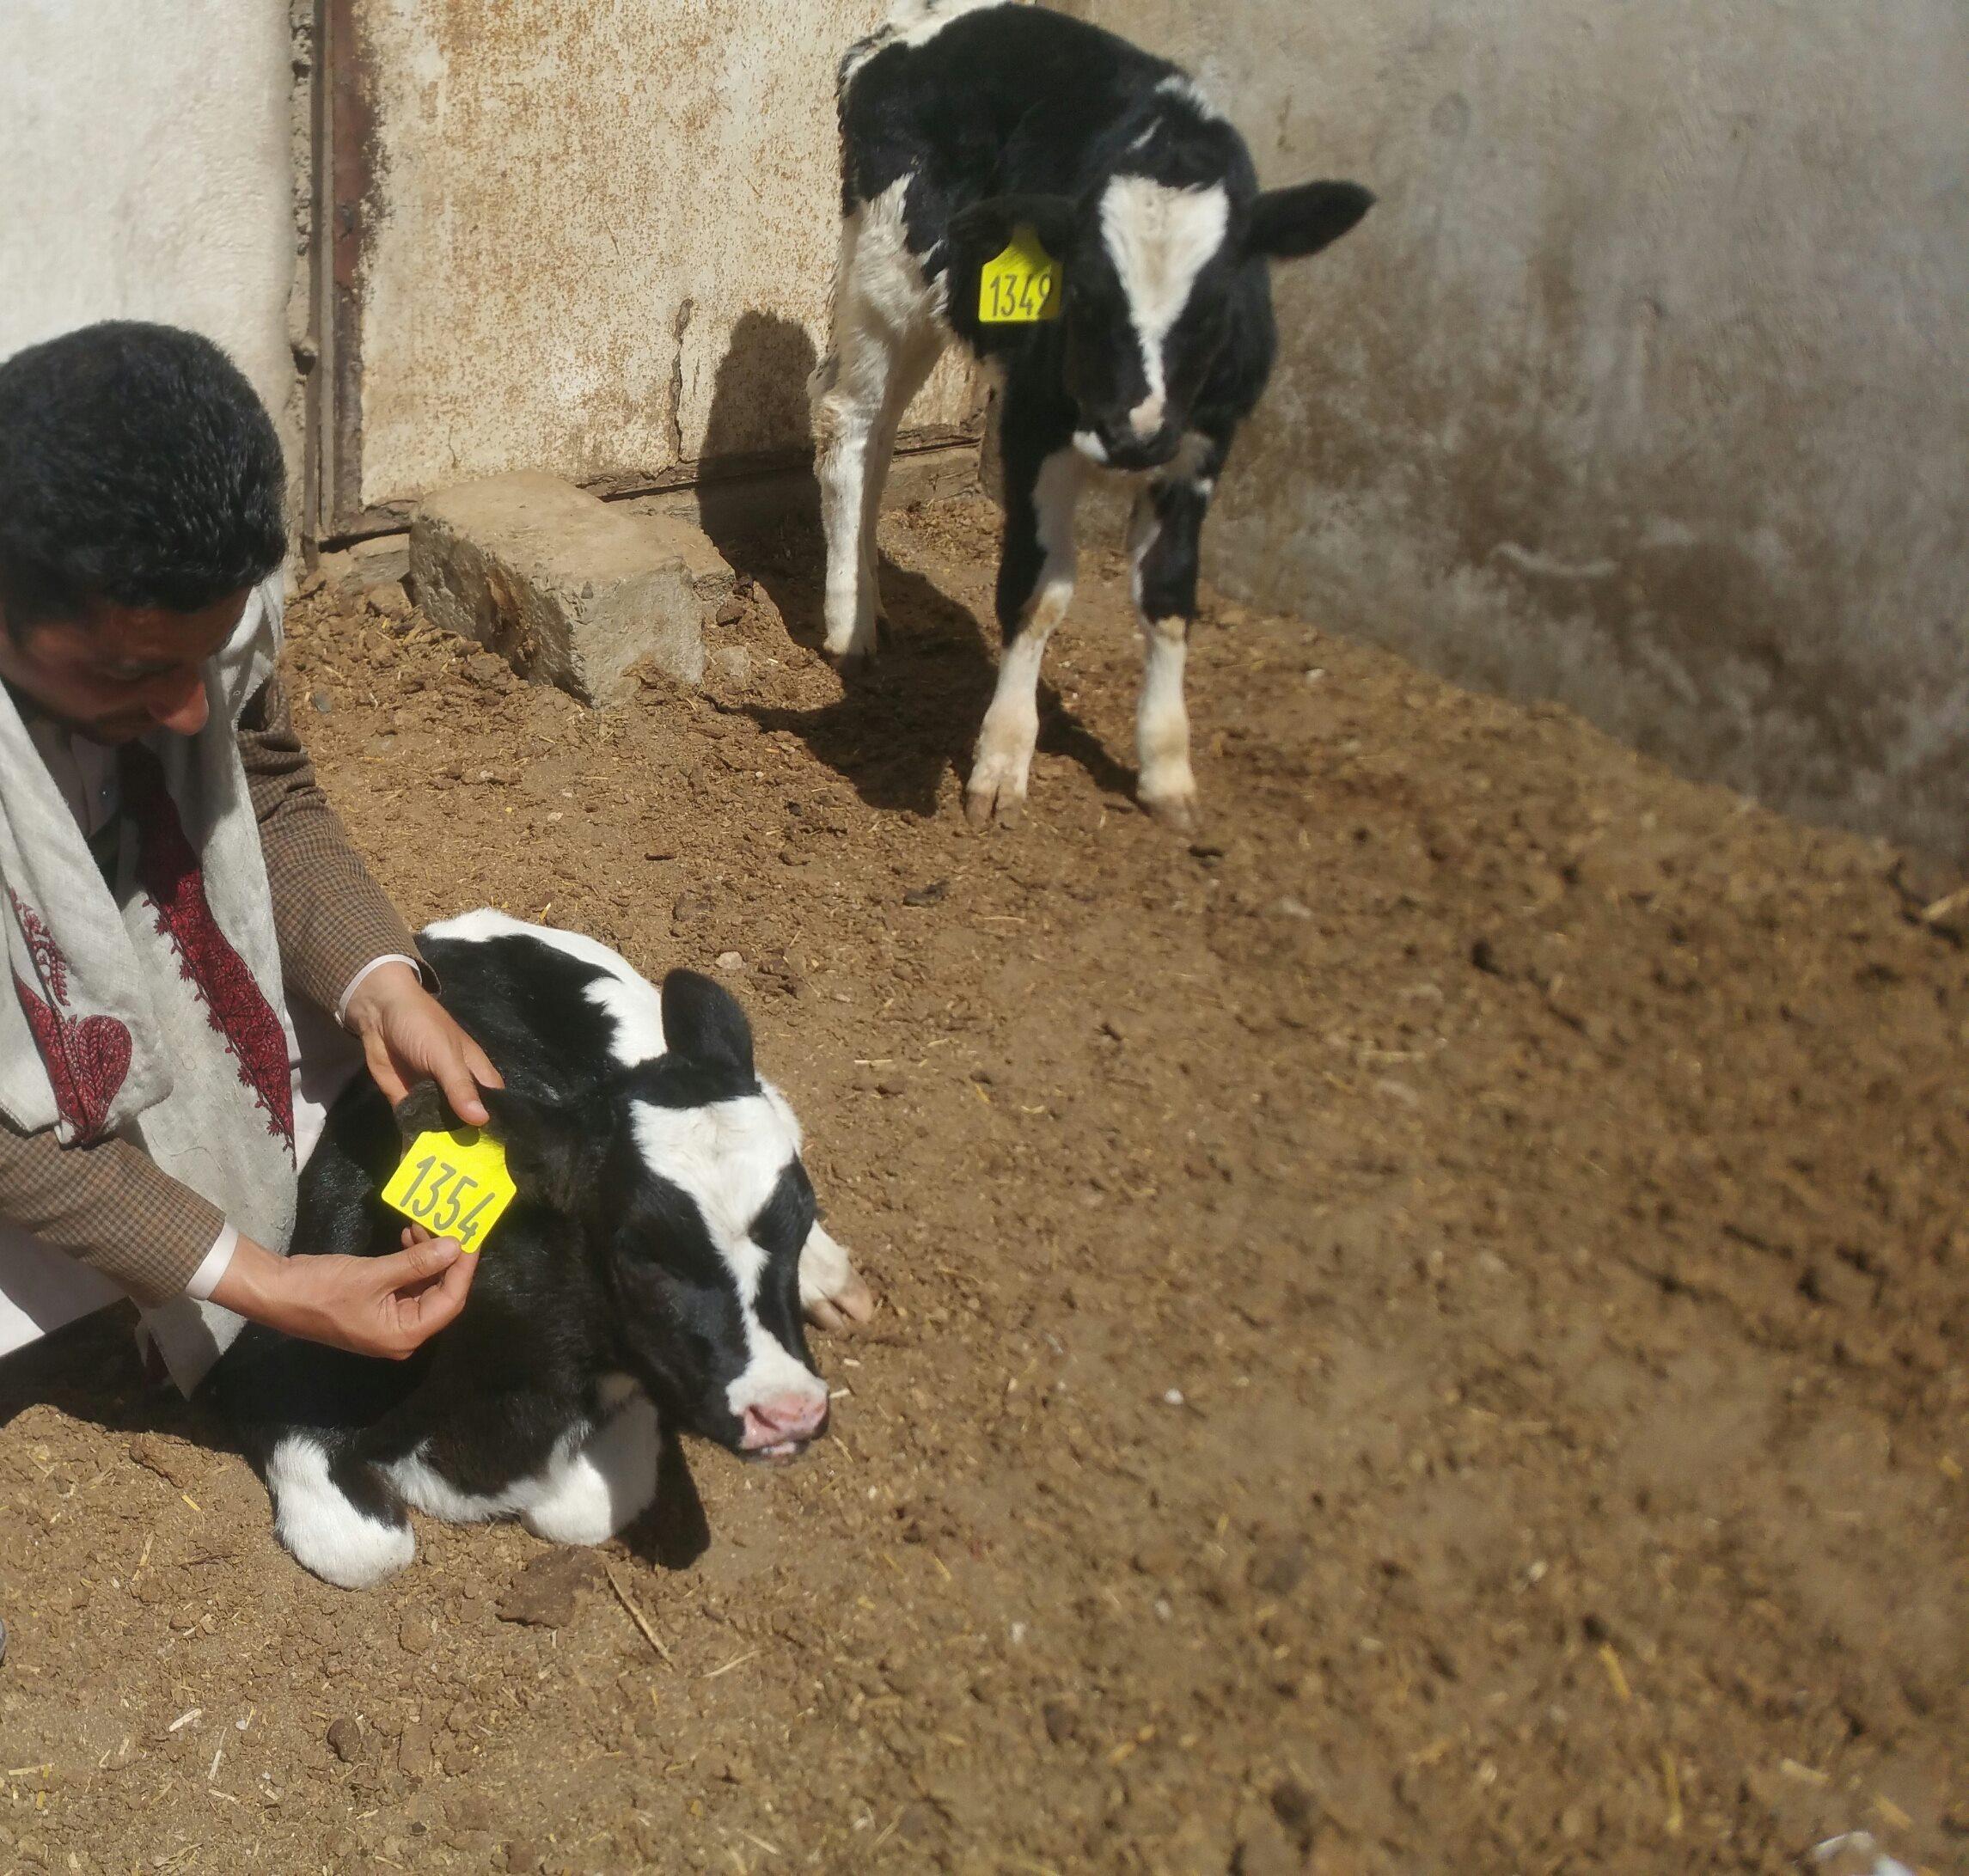 Dhamar farm rescue OWAP AR instructs Helall to release the calves 30 from concrete pens 19 jan 2018 Rosabah Farm27018671_1520763858042964_1772641965_o.jpg